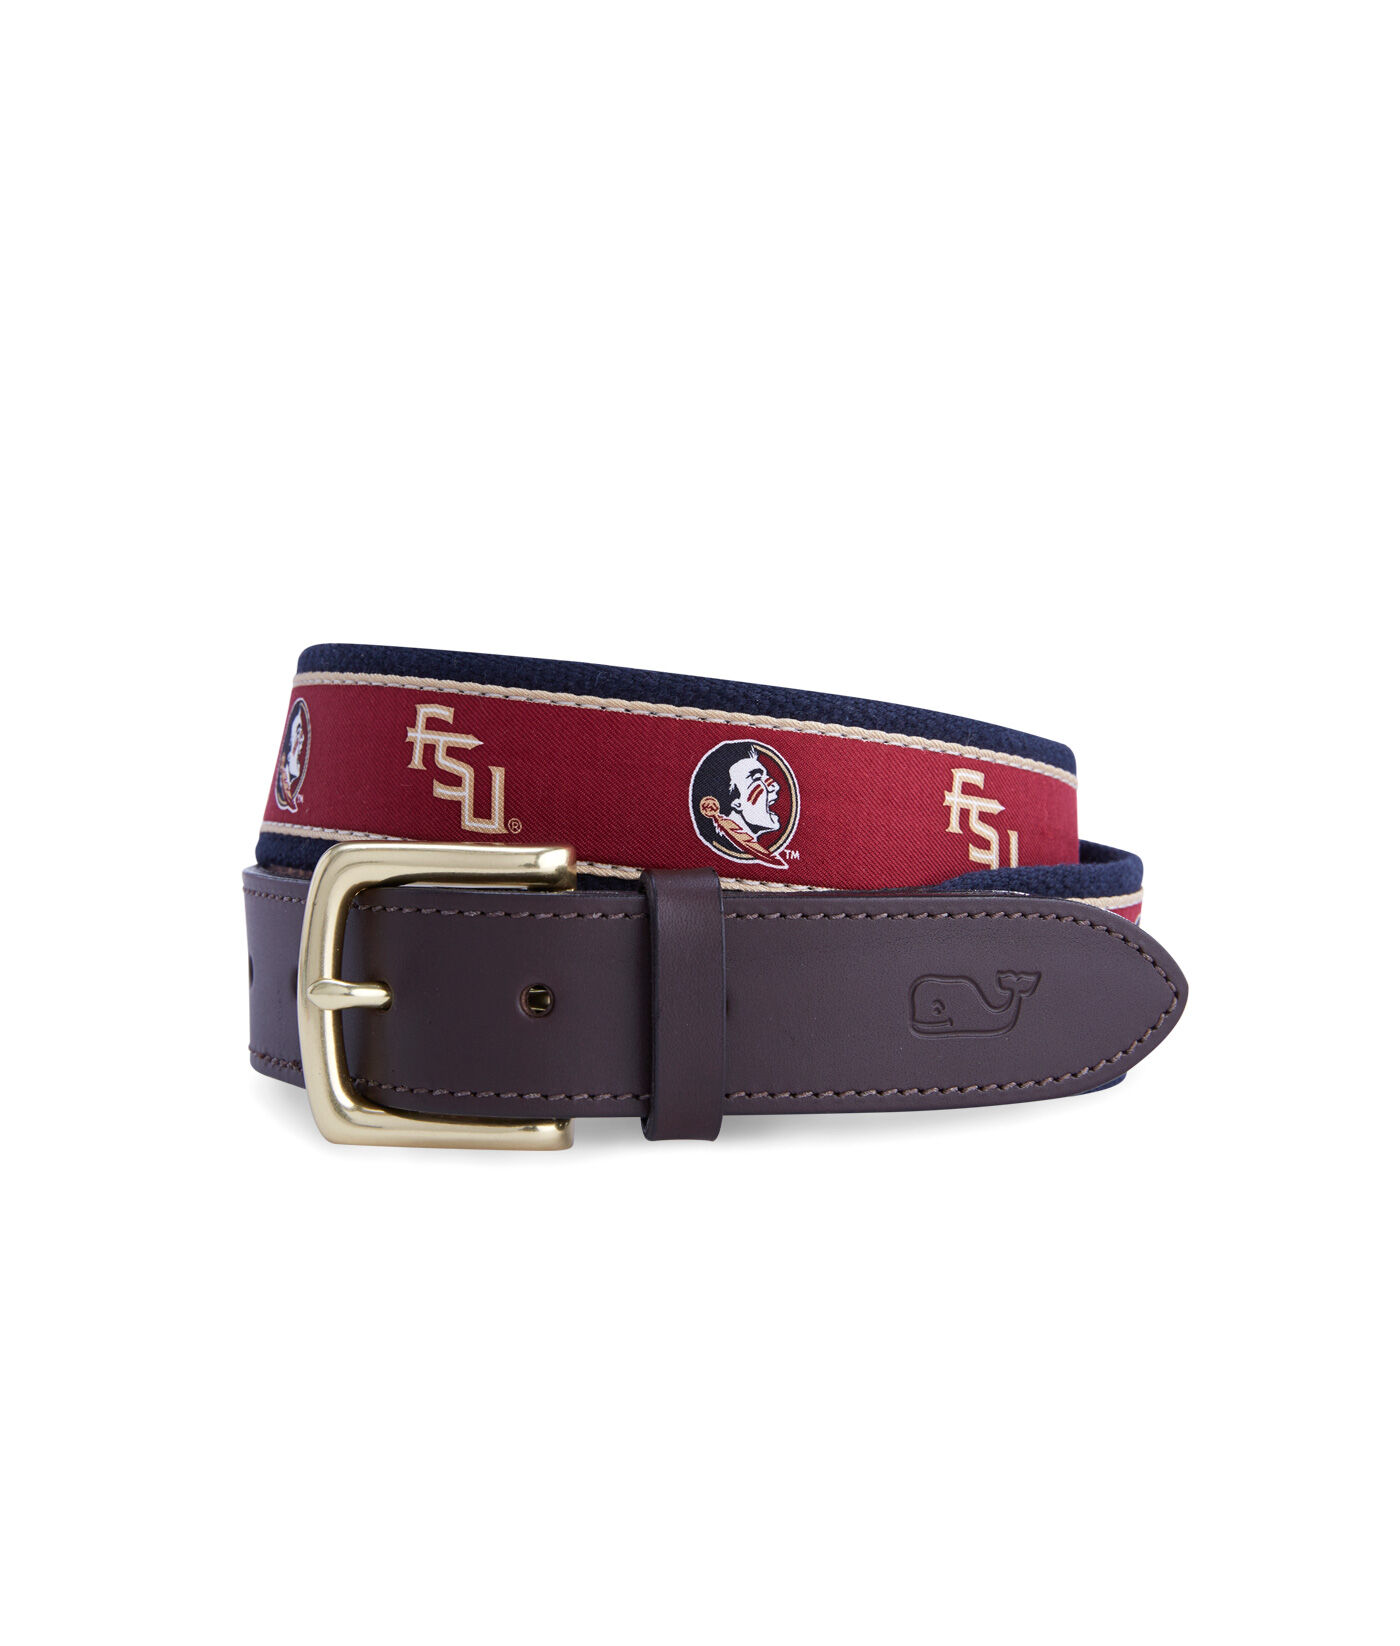 32 Collegiate Collection LSU Belt